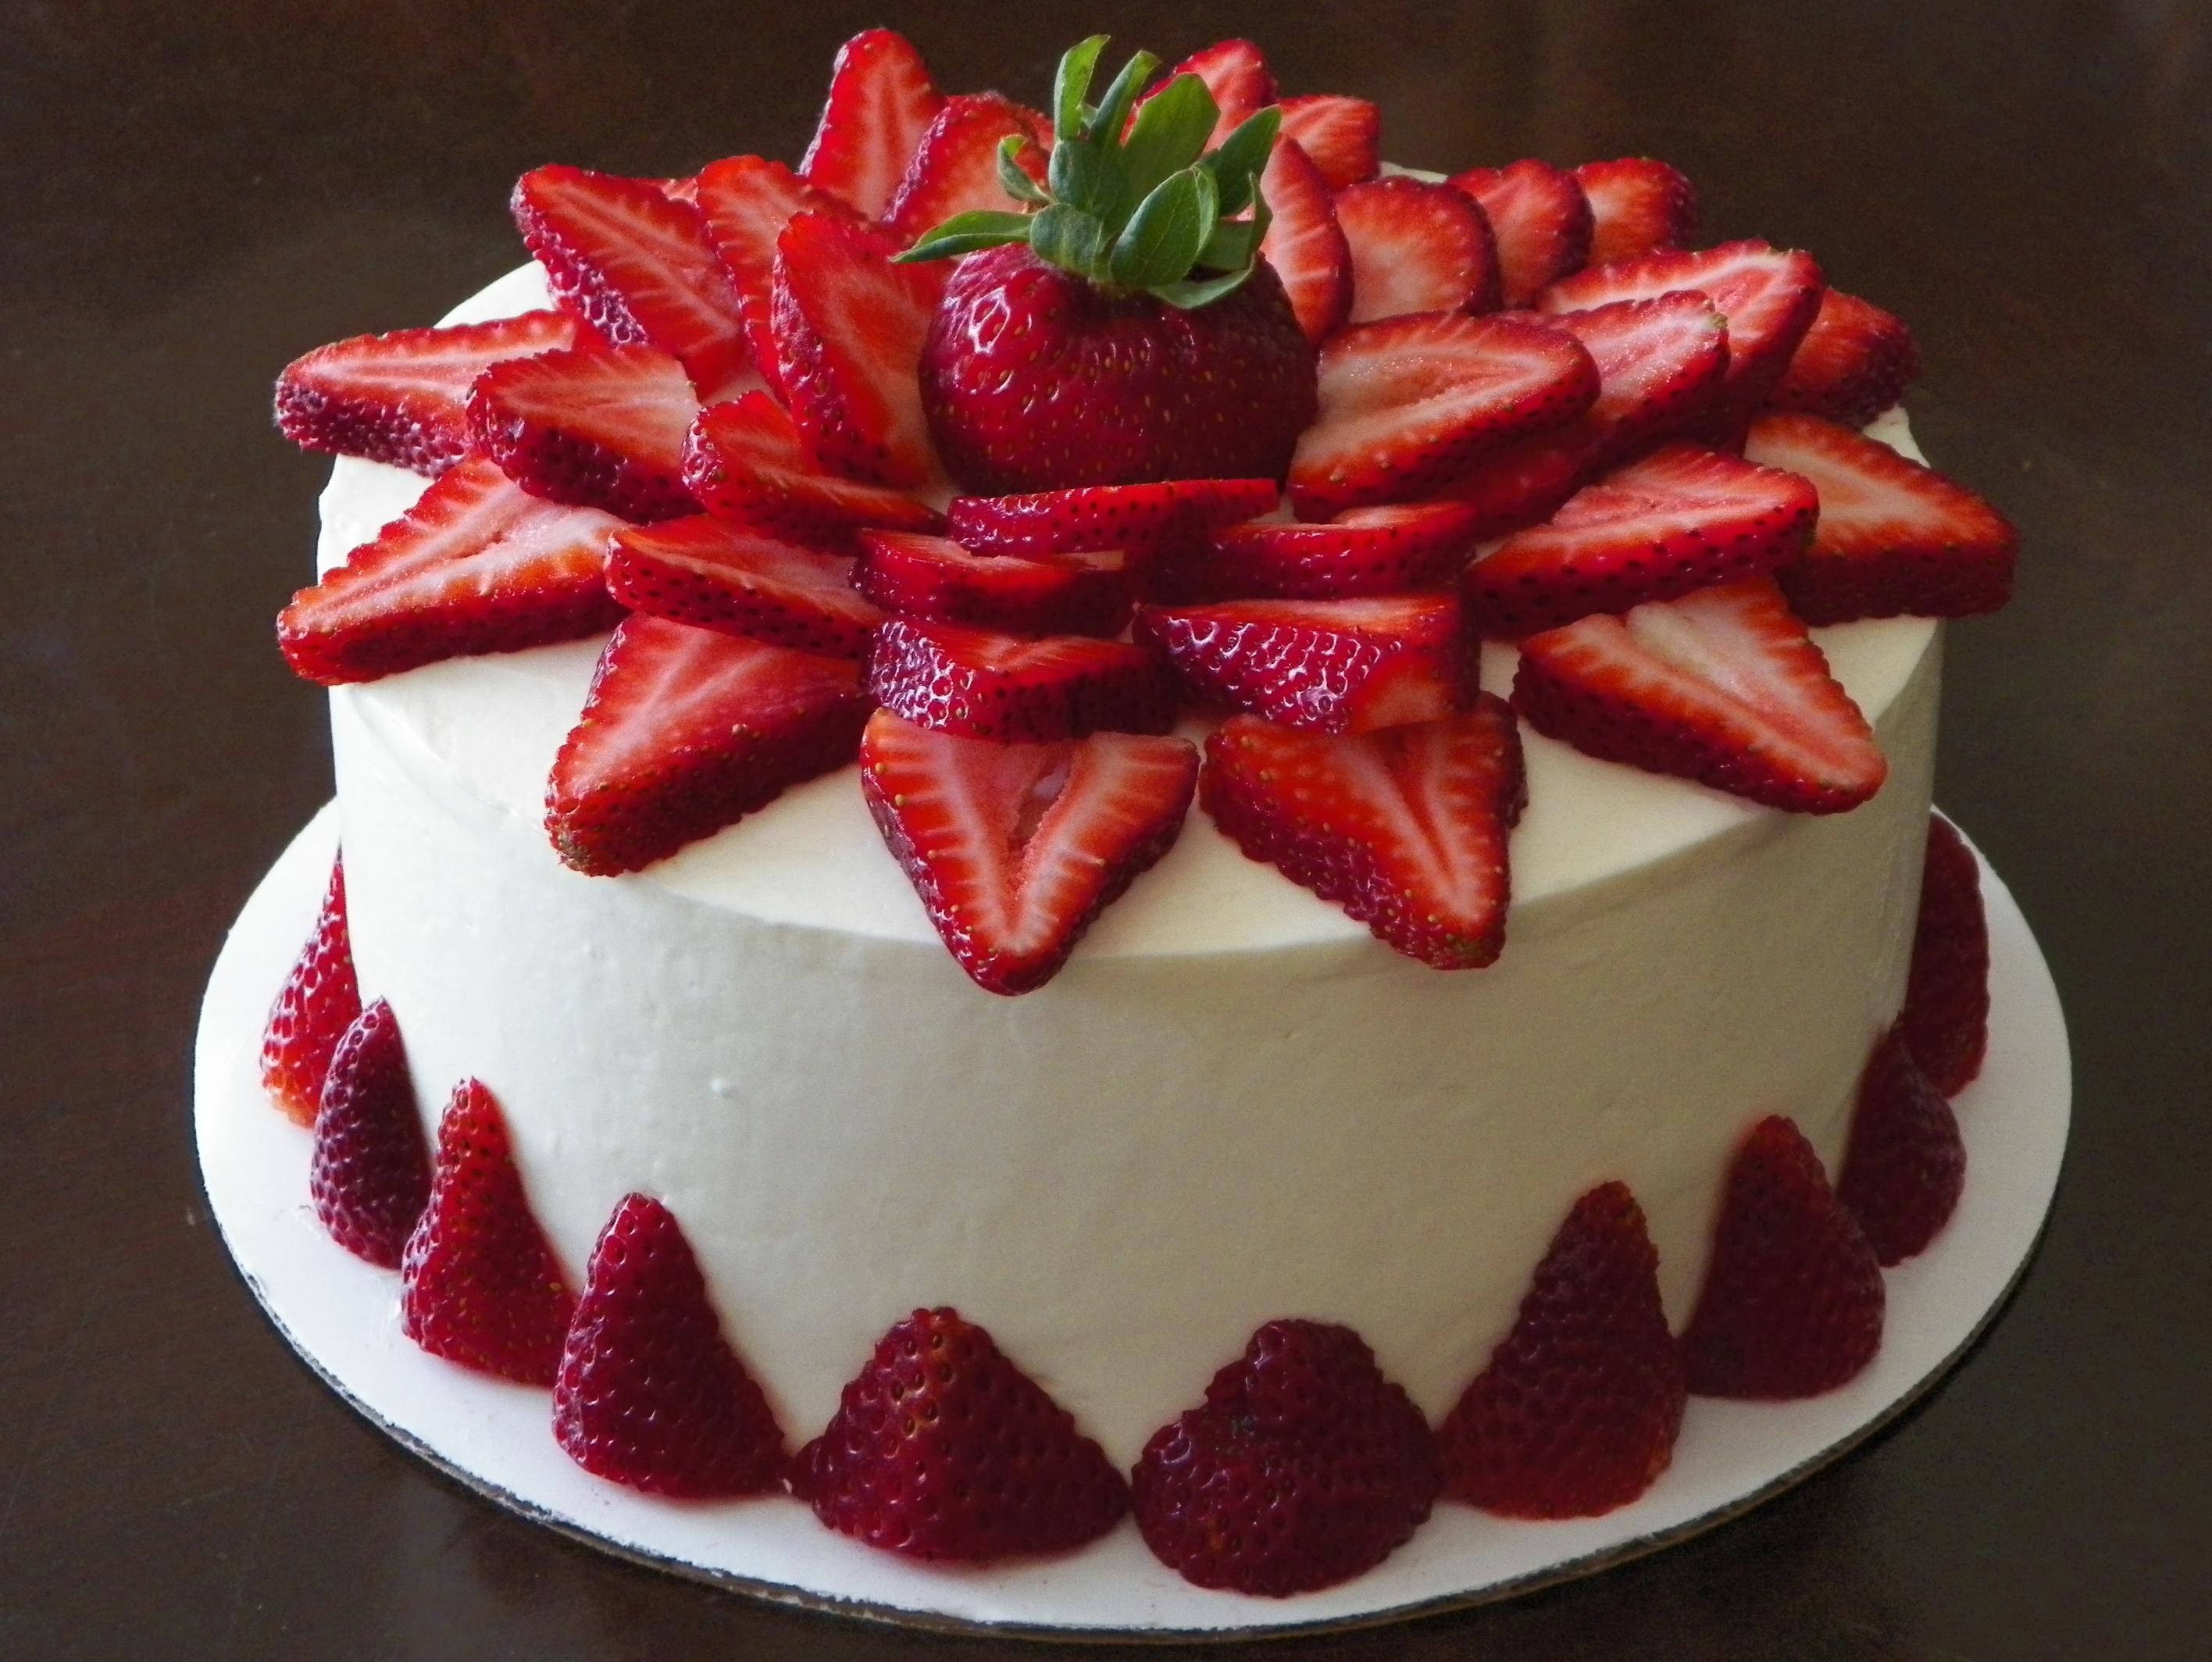 strawberry-cake-8-inch